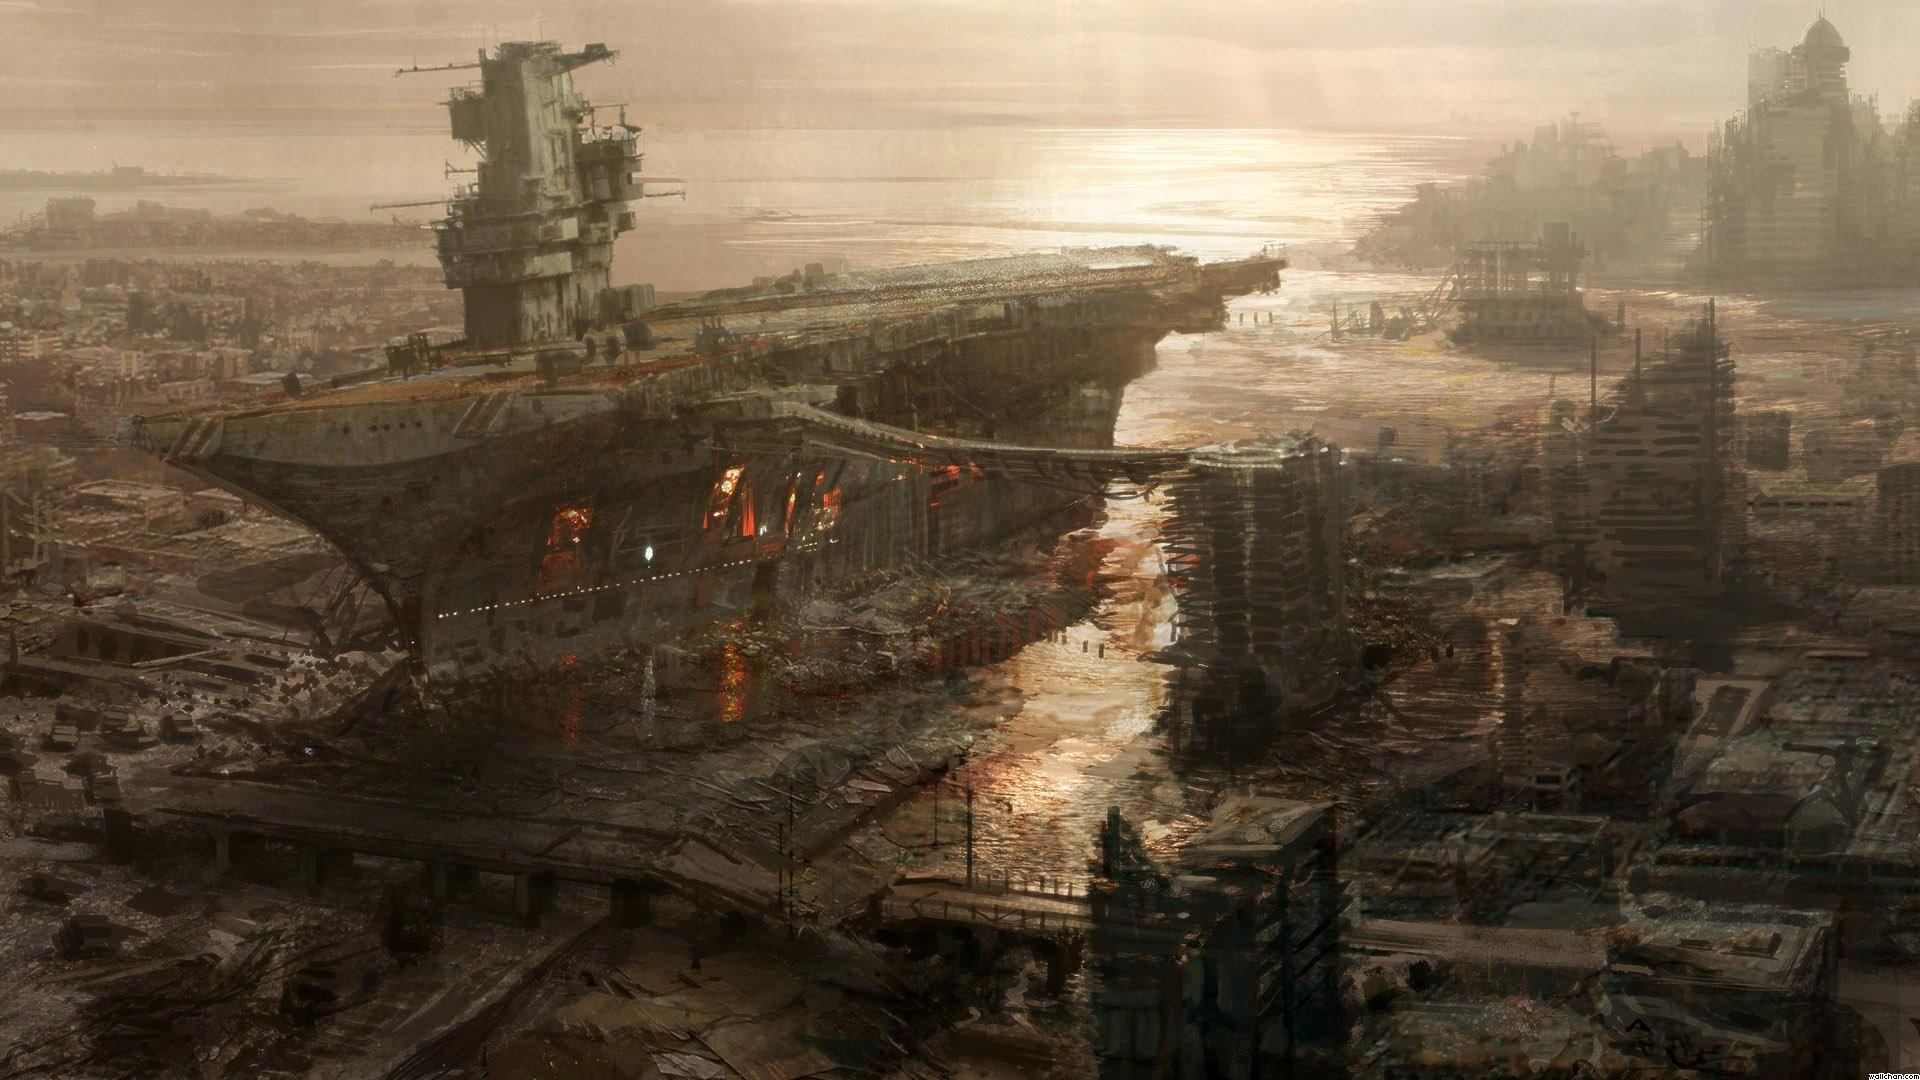 Google Image Result for  https://www.wallchan.com/images/sandbox/1305768331-ship-carrier-fallout-sea-boat- apocalypse-rivet-city-wallpaper.jpg | Pinterest …